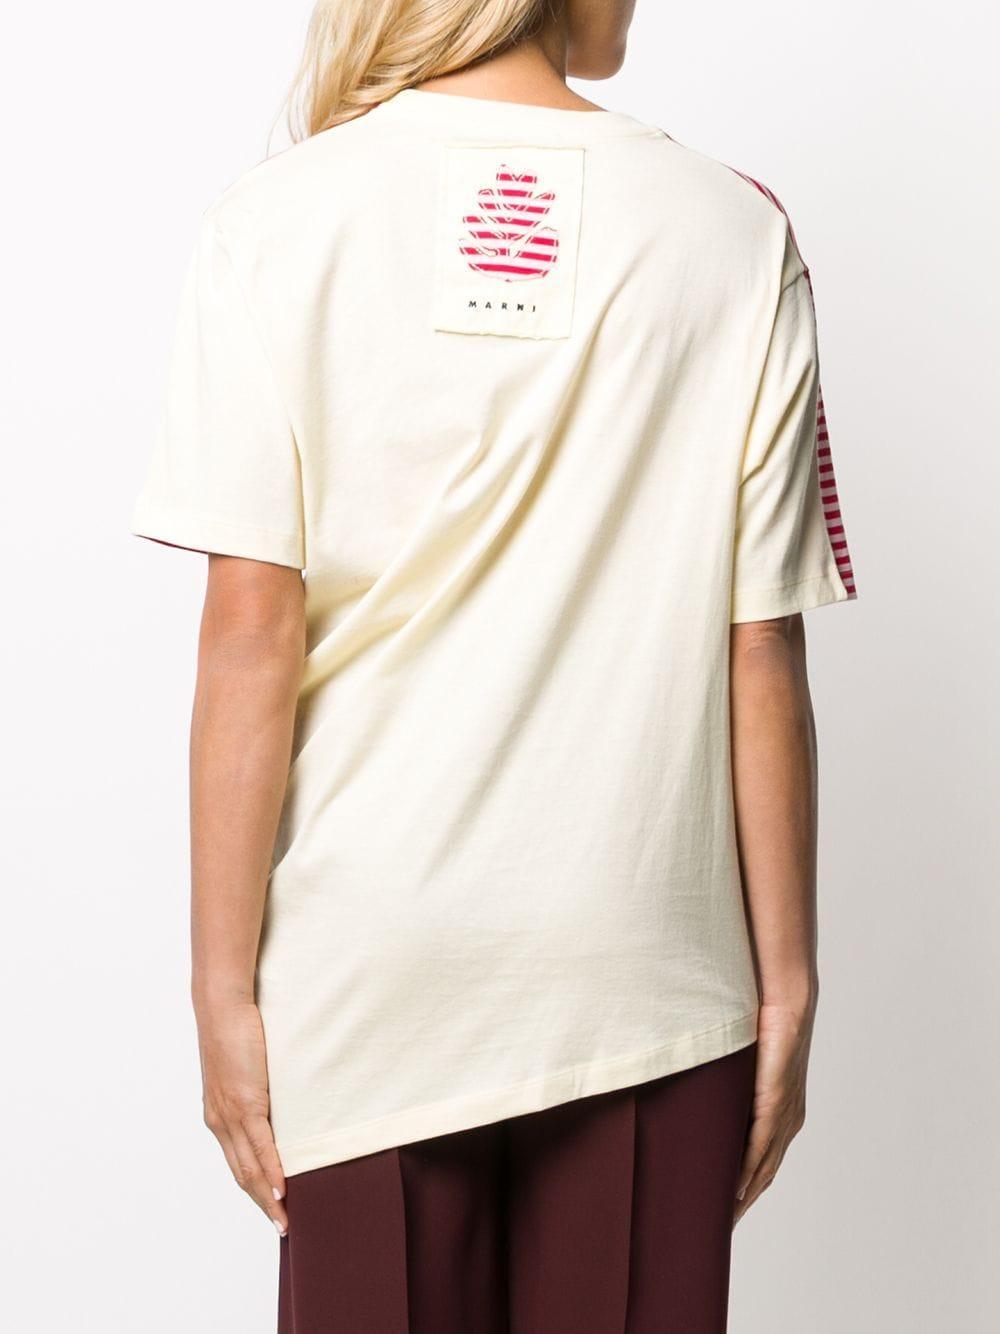 Camiseta asimétrica a rayas Marni de Algodón de color Rojo